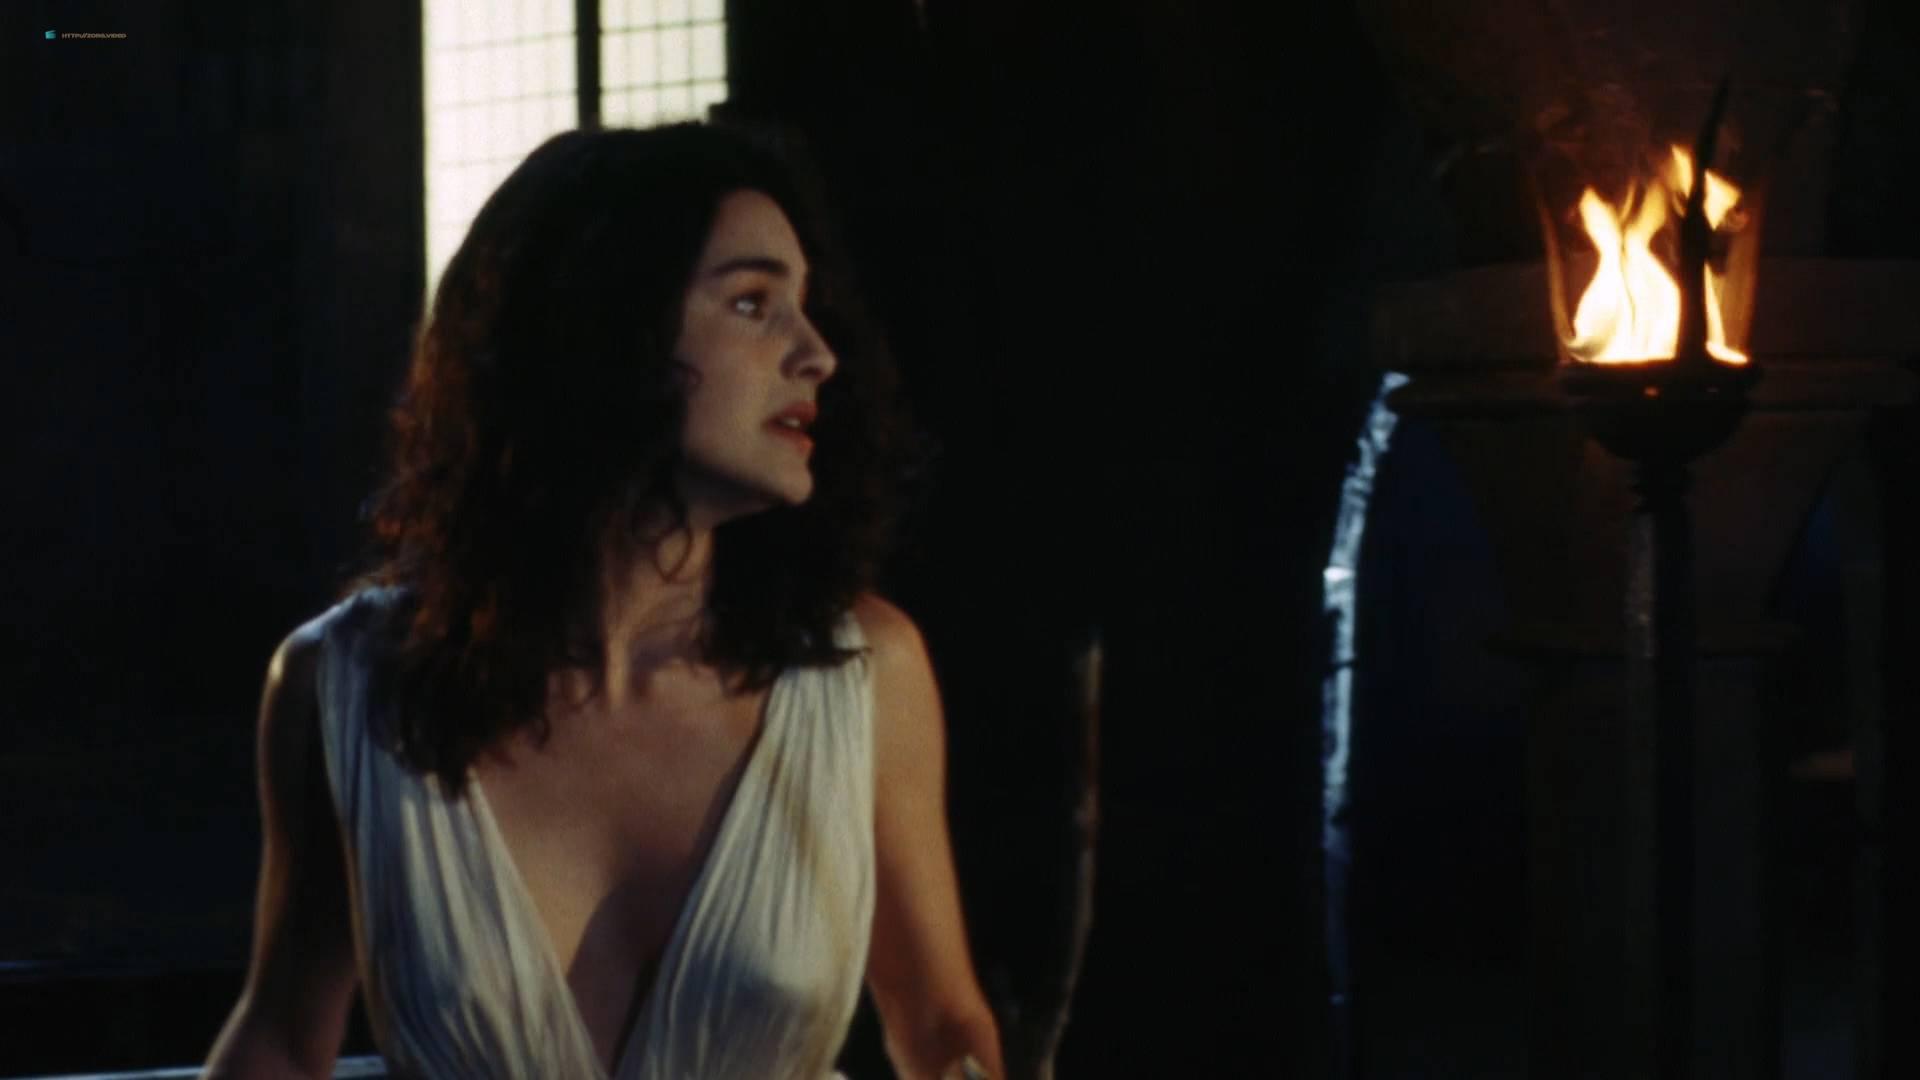 Denice Duff nude bush in the shower Melanie Shatner nude boobs - Bloodstone: Subspecies II (1993) HD 1080p BluRay (15)